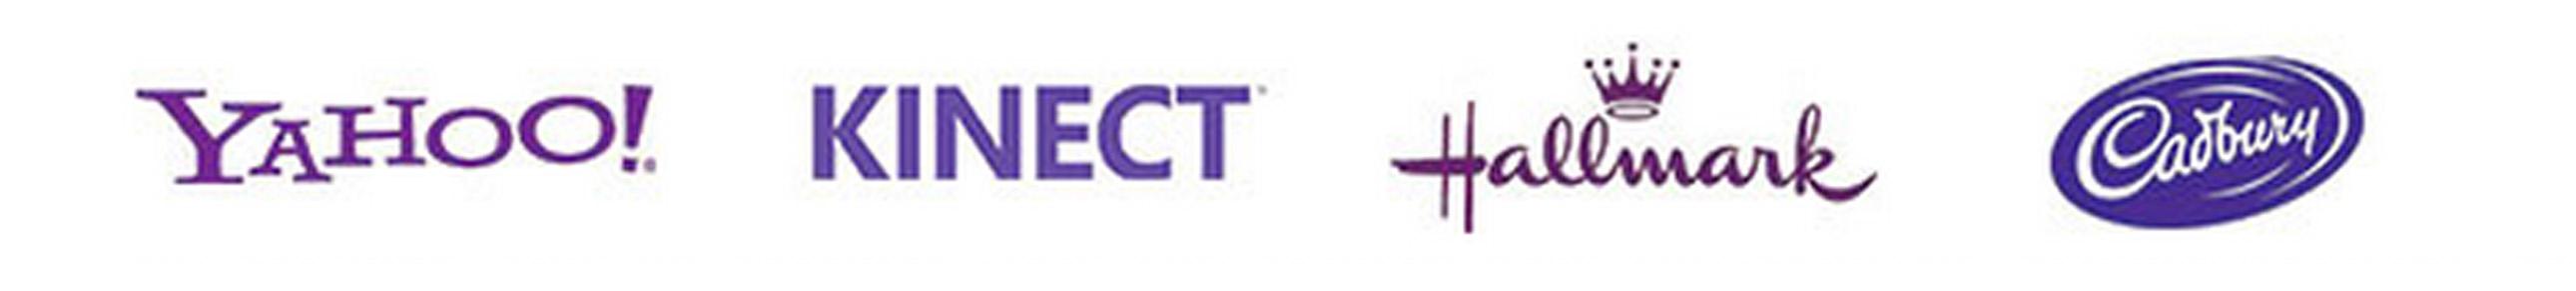 purple-color-brand